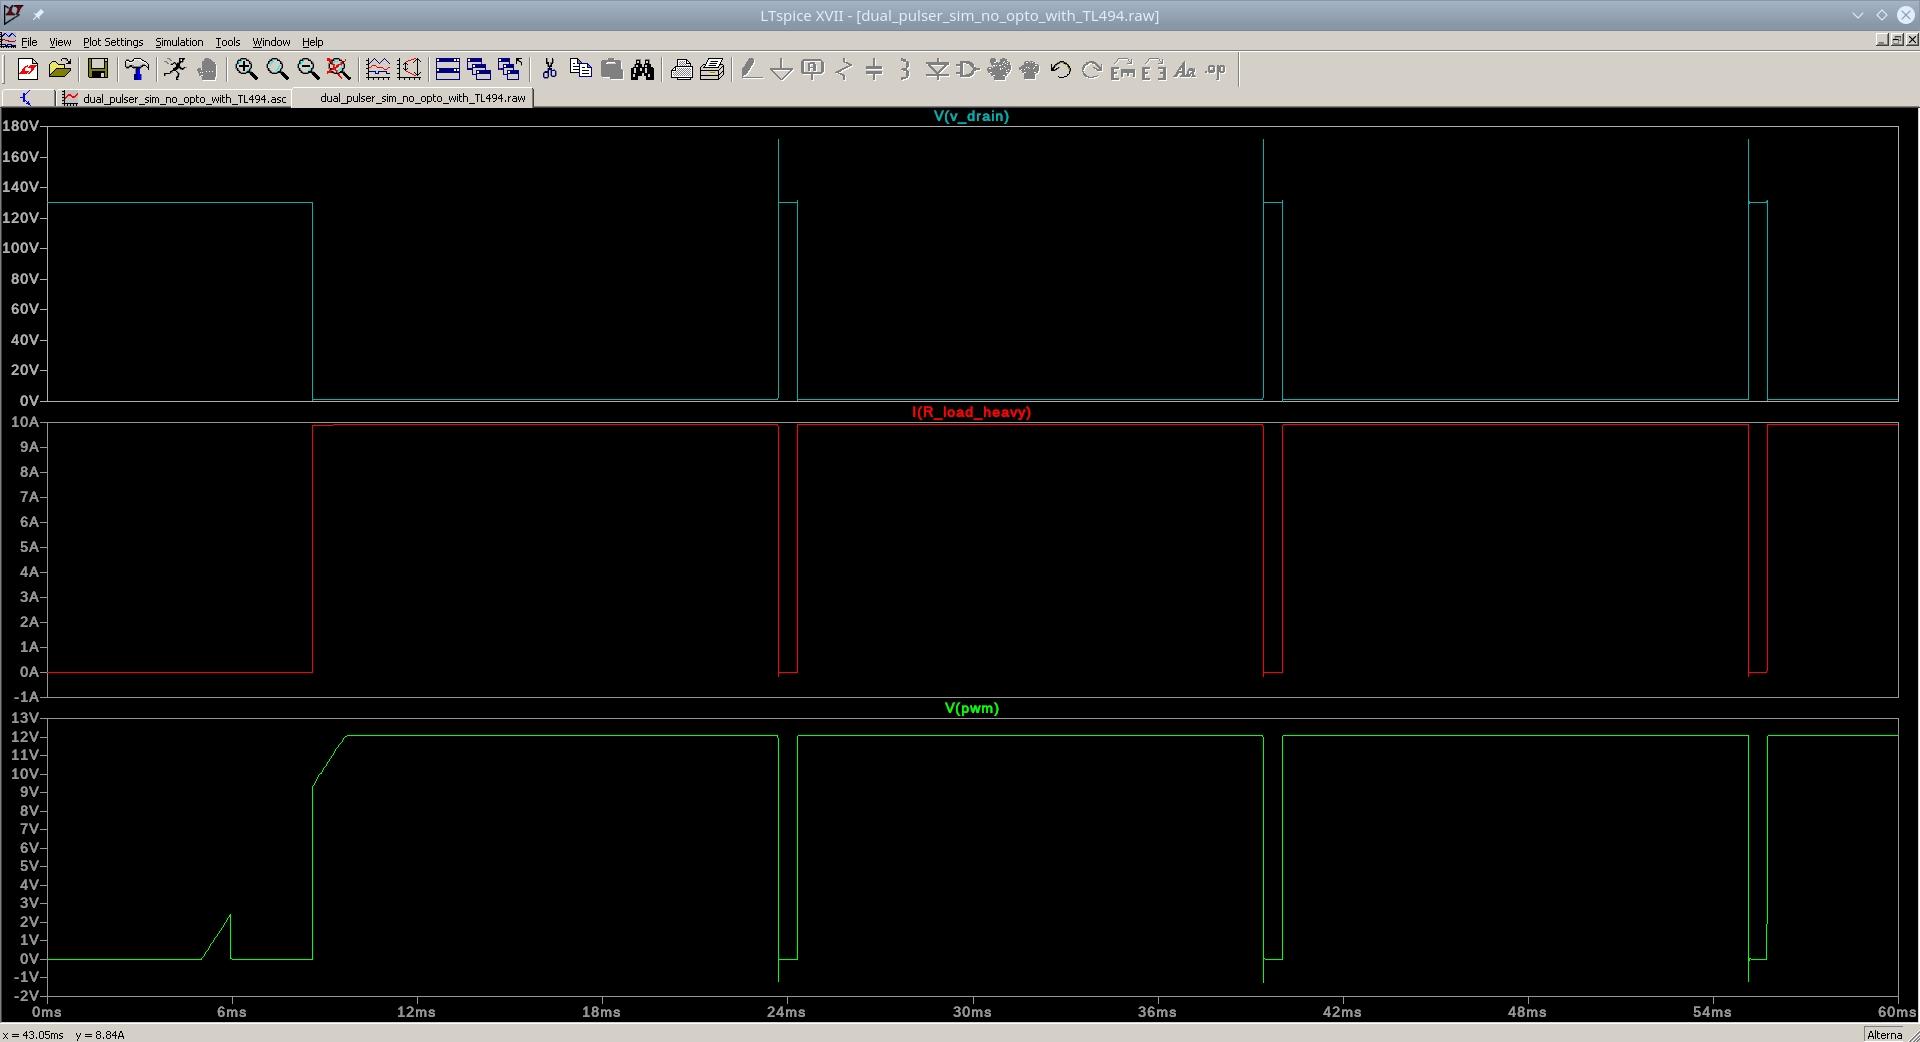 MK Dynamics - Electronics - Power Electronics - Quasi-DC